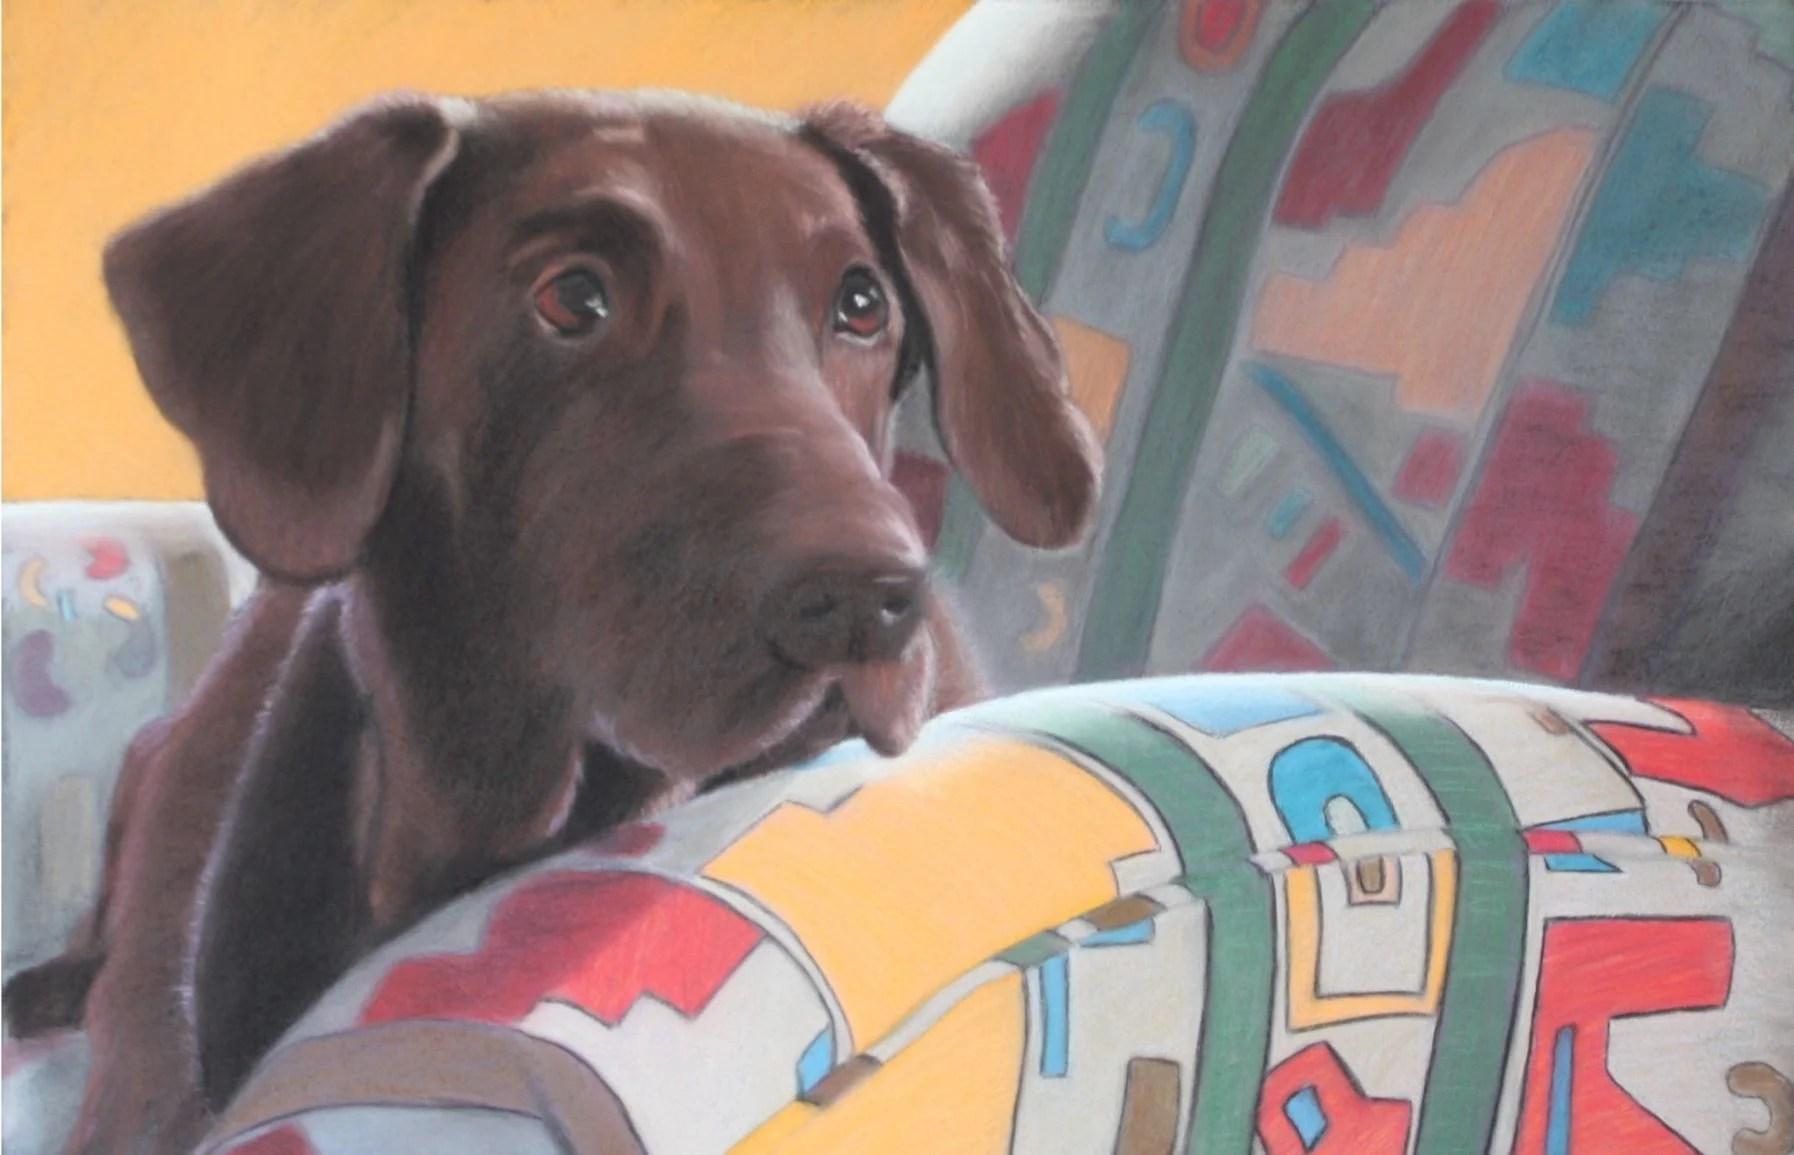 Mutable Moussie Heider Show Spotlights Pets Plants Aaron Rodgers Dog Selfie Aaron Rodgers Dogs Name bark post Aaron Rodgers Dog